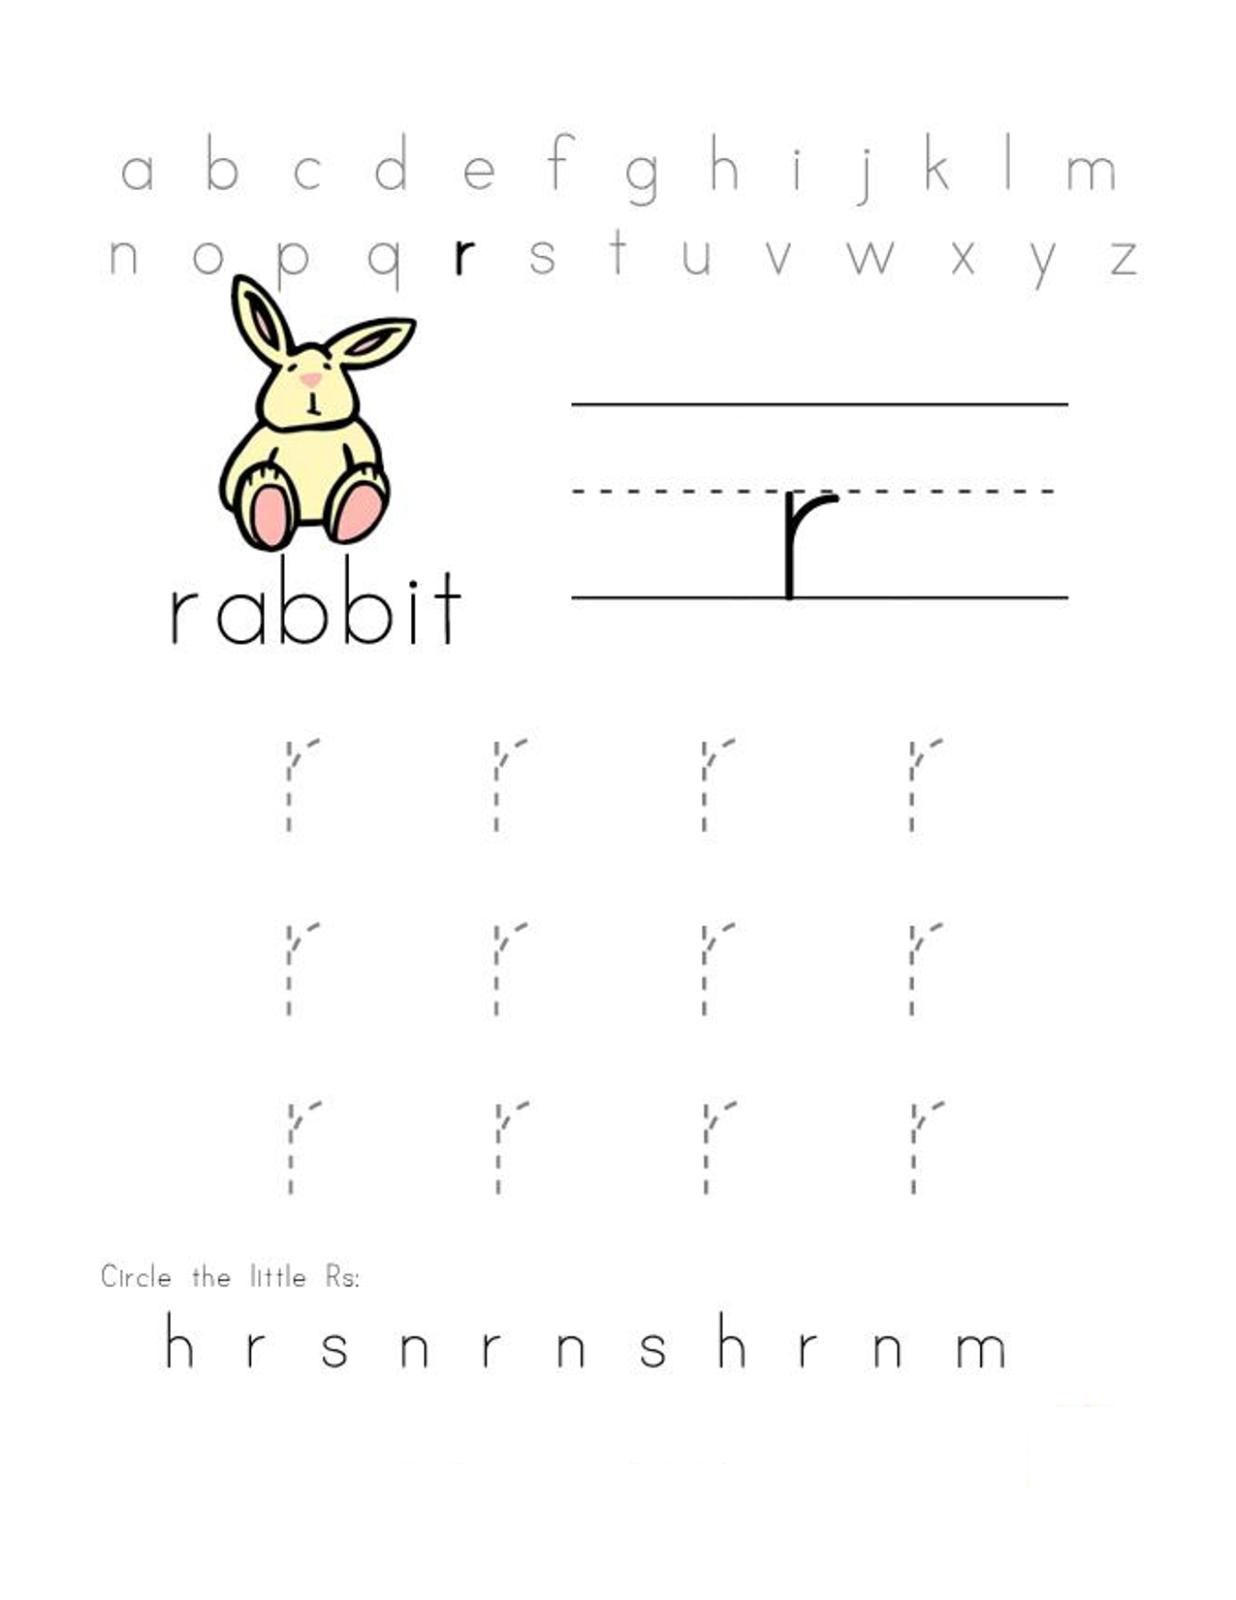 free preschool printables letter R